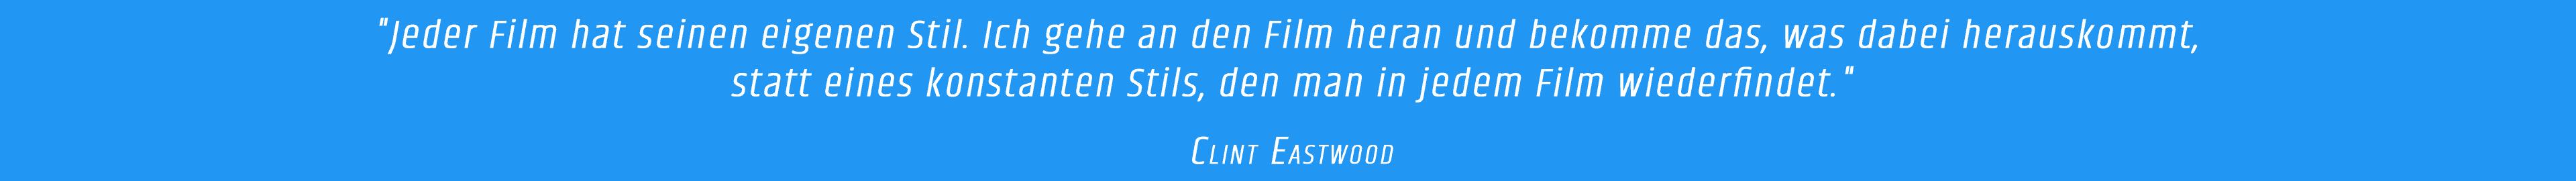 Zitat - Clint Eastwood